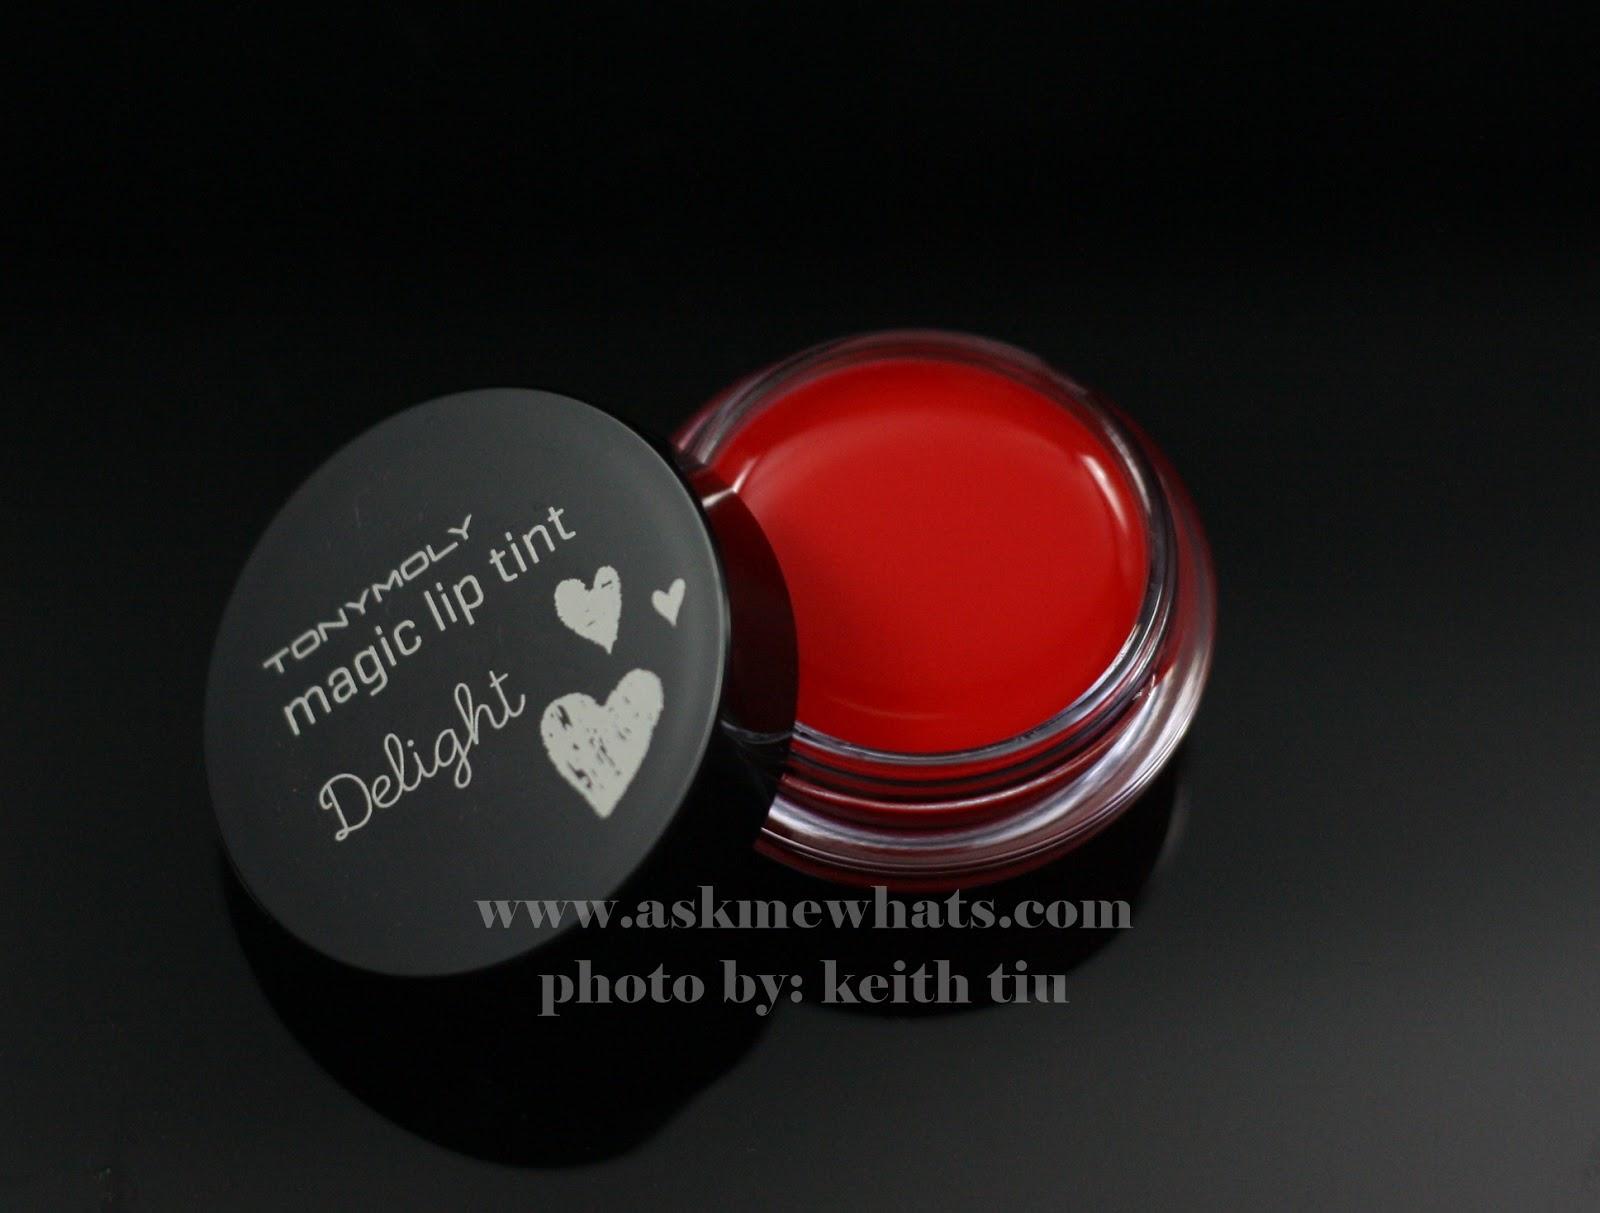 Tony Moly Delight Magic Lip Tint Review Liptint Askmewhats Top Beauty Blogger Philippines Skincare Makeup Tonymoly 7g